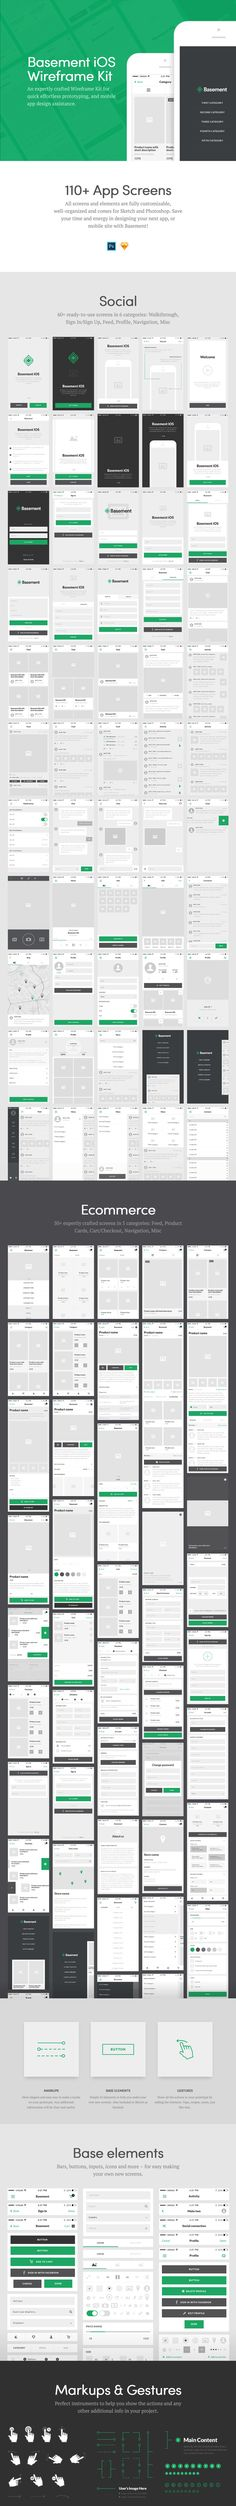 Basement-iOS Designmodo Market - UI Kits - Ideas of UI Kits - Basement iOS on Market (market. App Wireframe, Wireframe Design, App Ui Design, User Interface Design, Mobile Wireframe, Design Thinking, Motion Design, Graphisches Design, Flow Design